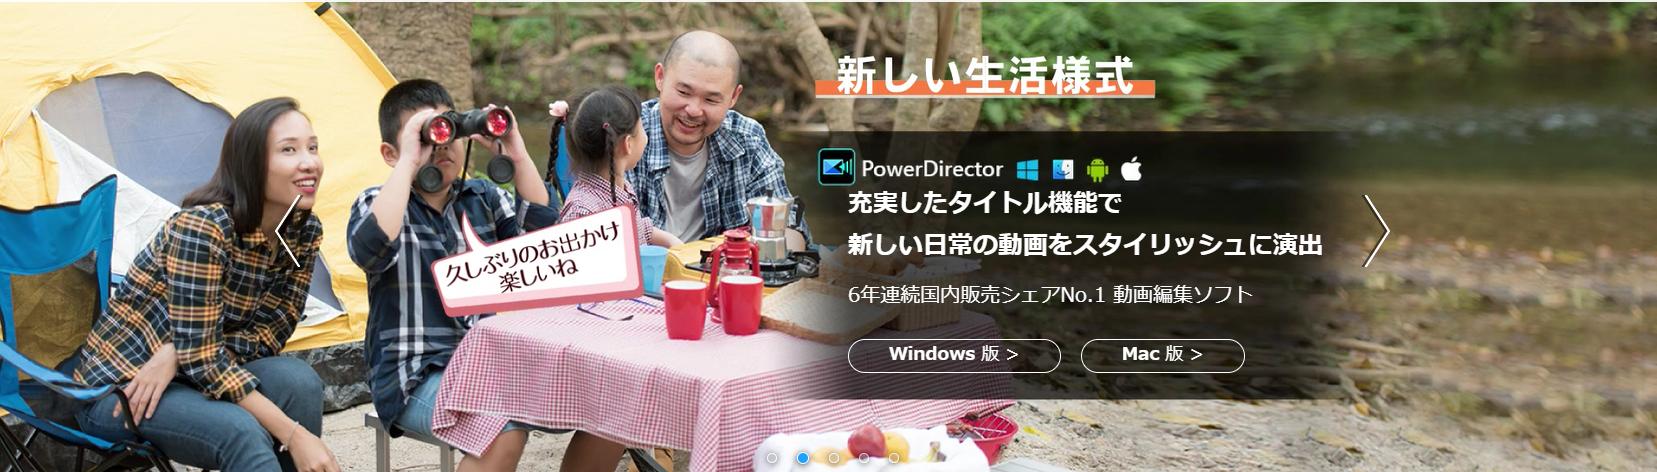 PowerDirector365サービスサイト キャプチャ